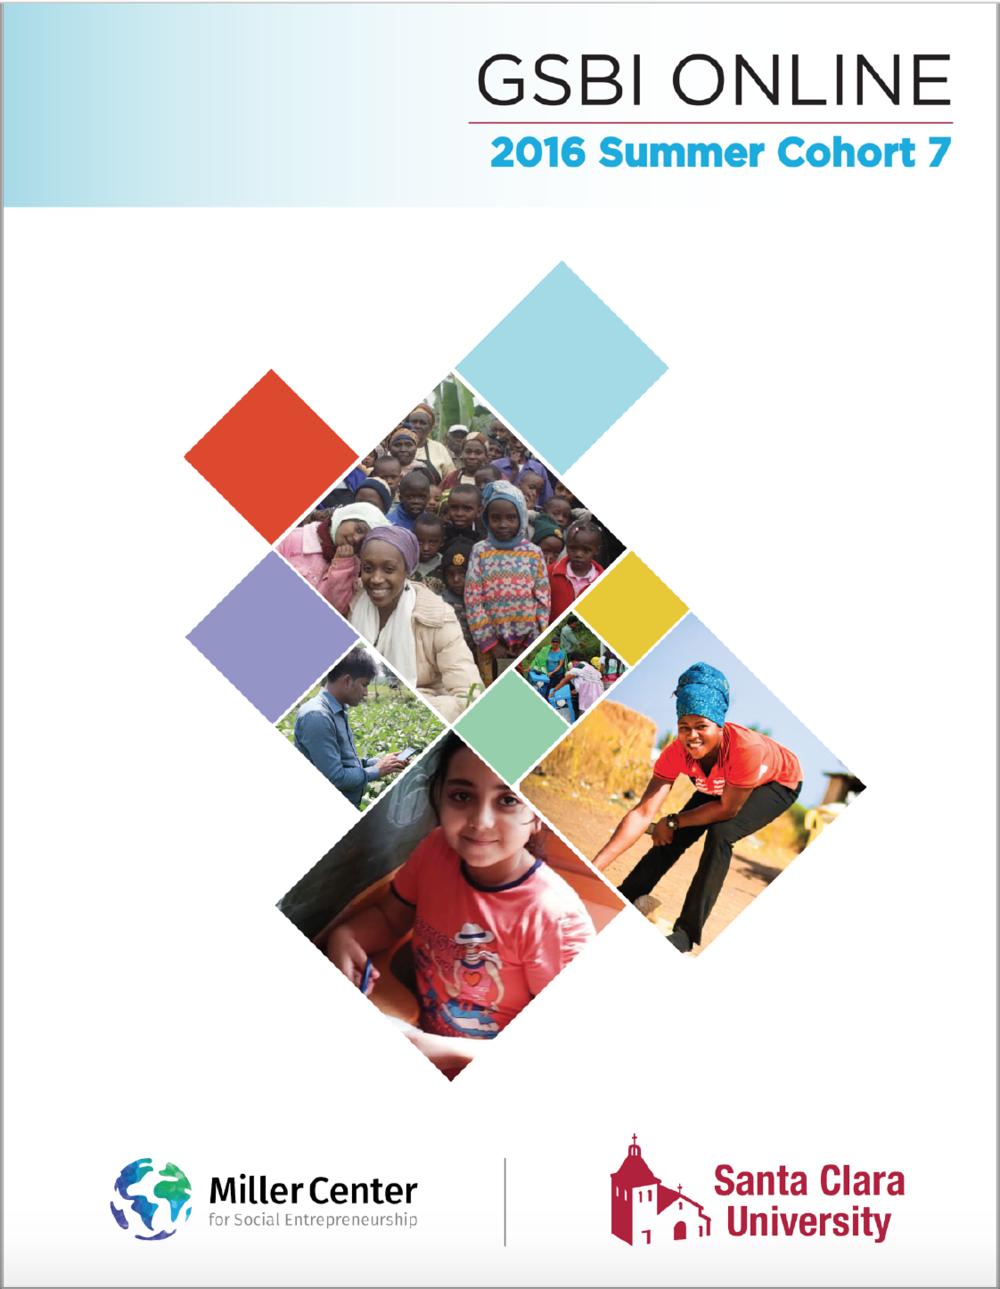 2016 GSBI Online: Summer Cohort 7